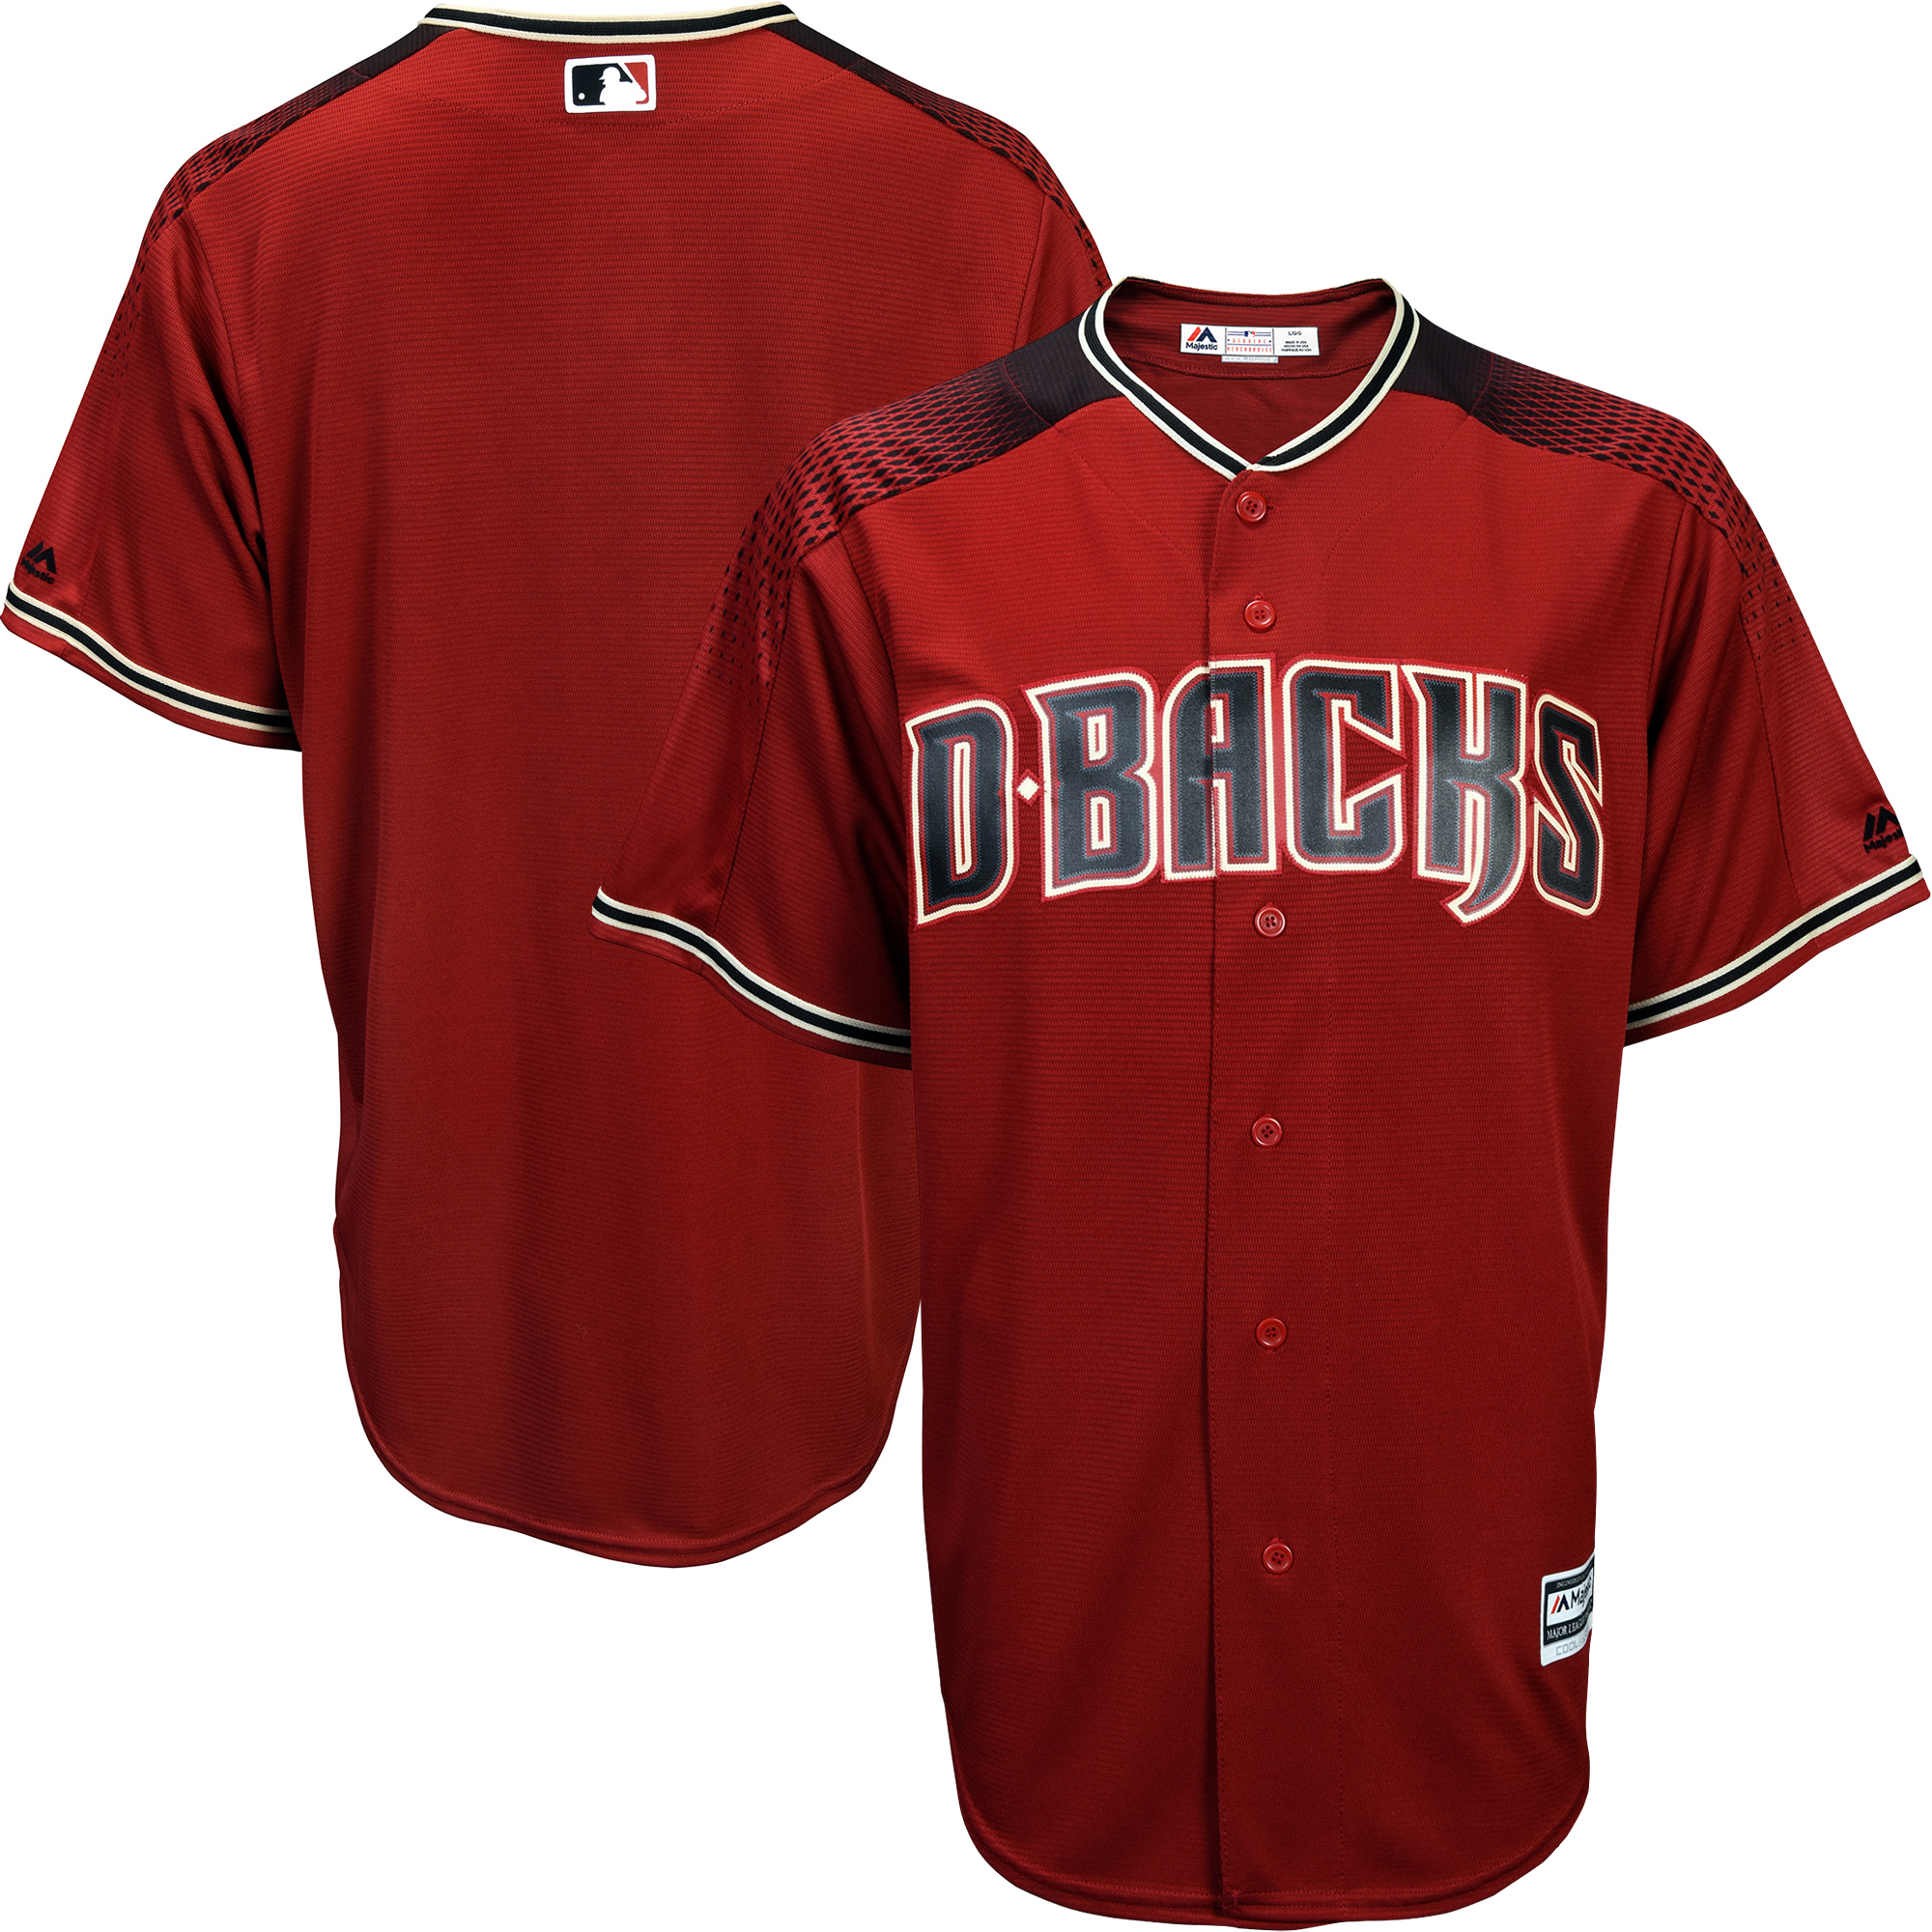 Arizona Diamondbacks Majestic Official Cool Base Jersey - Sedona Red/Black